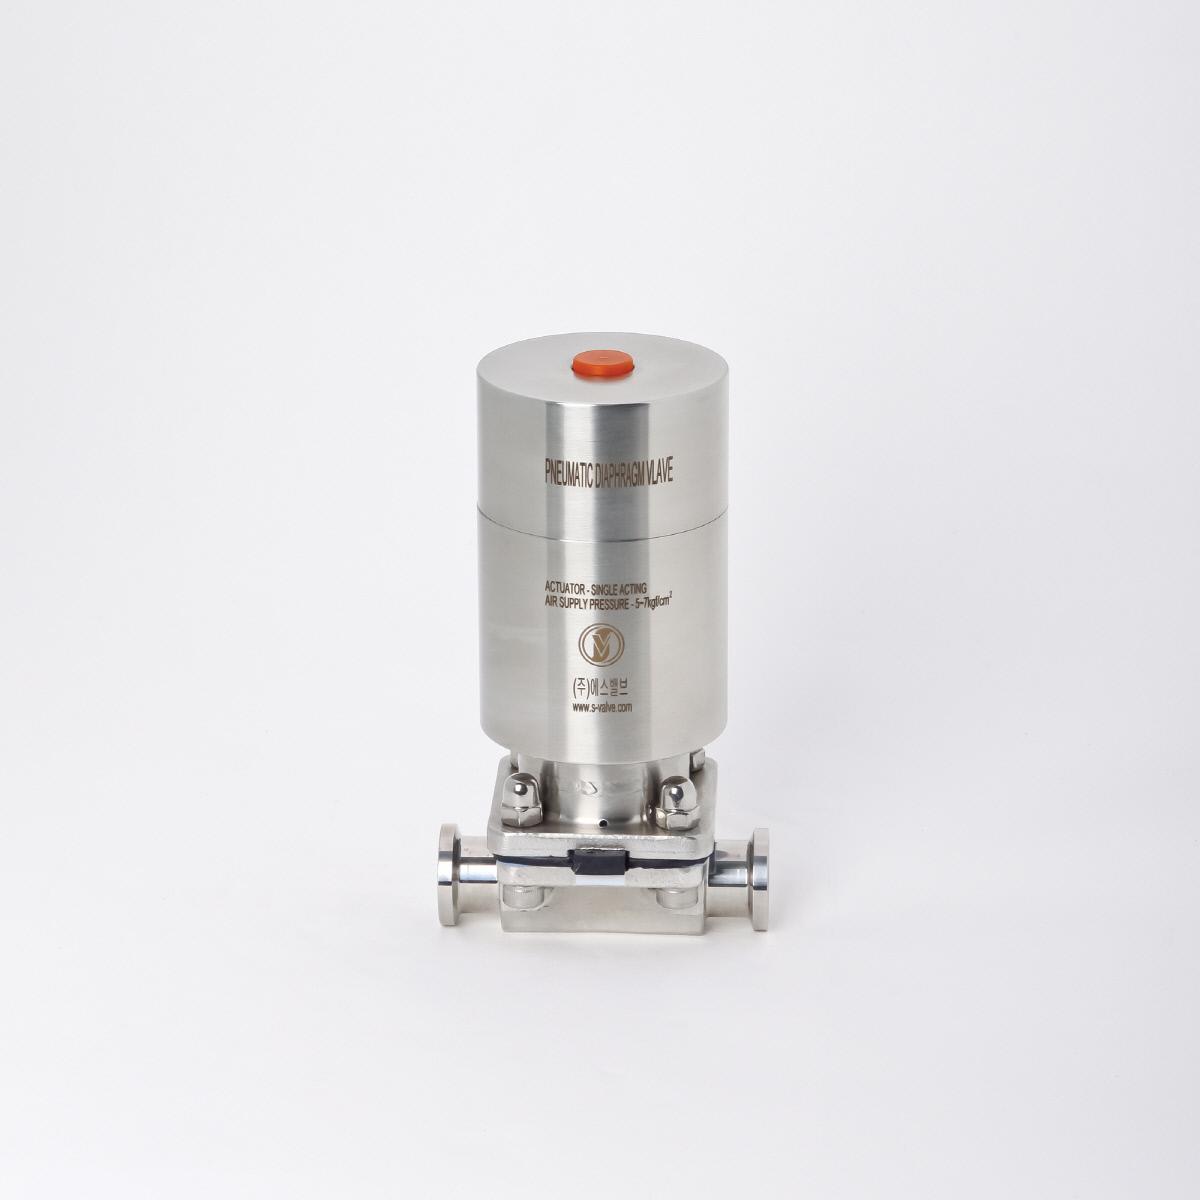 S-valve_0027.jpg